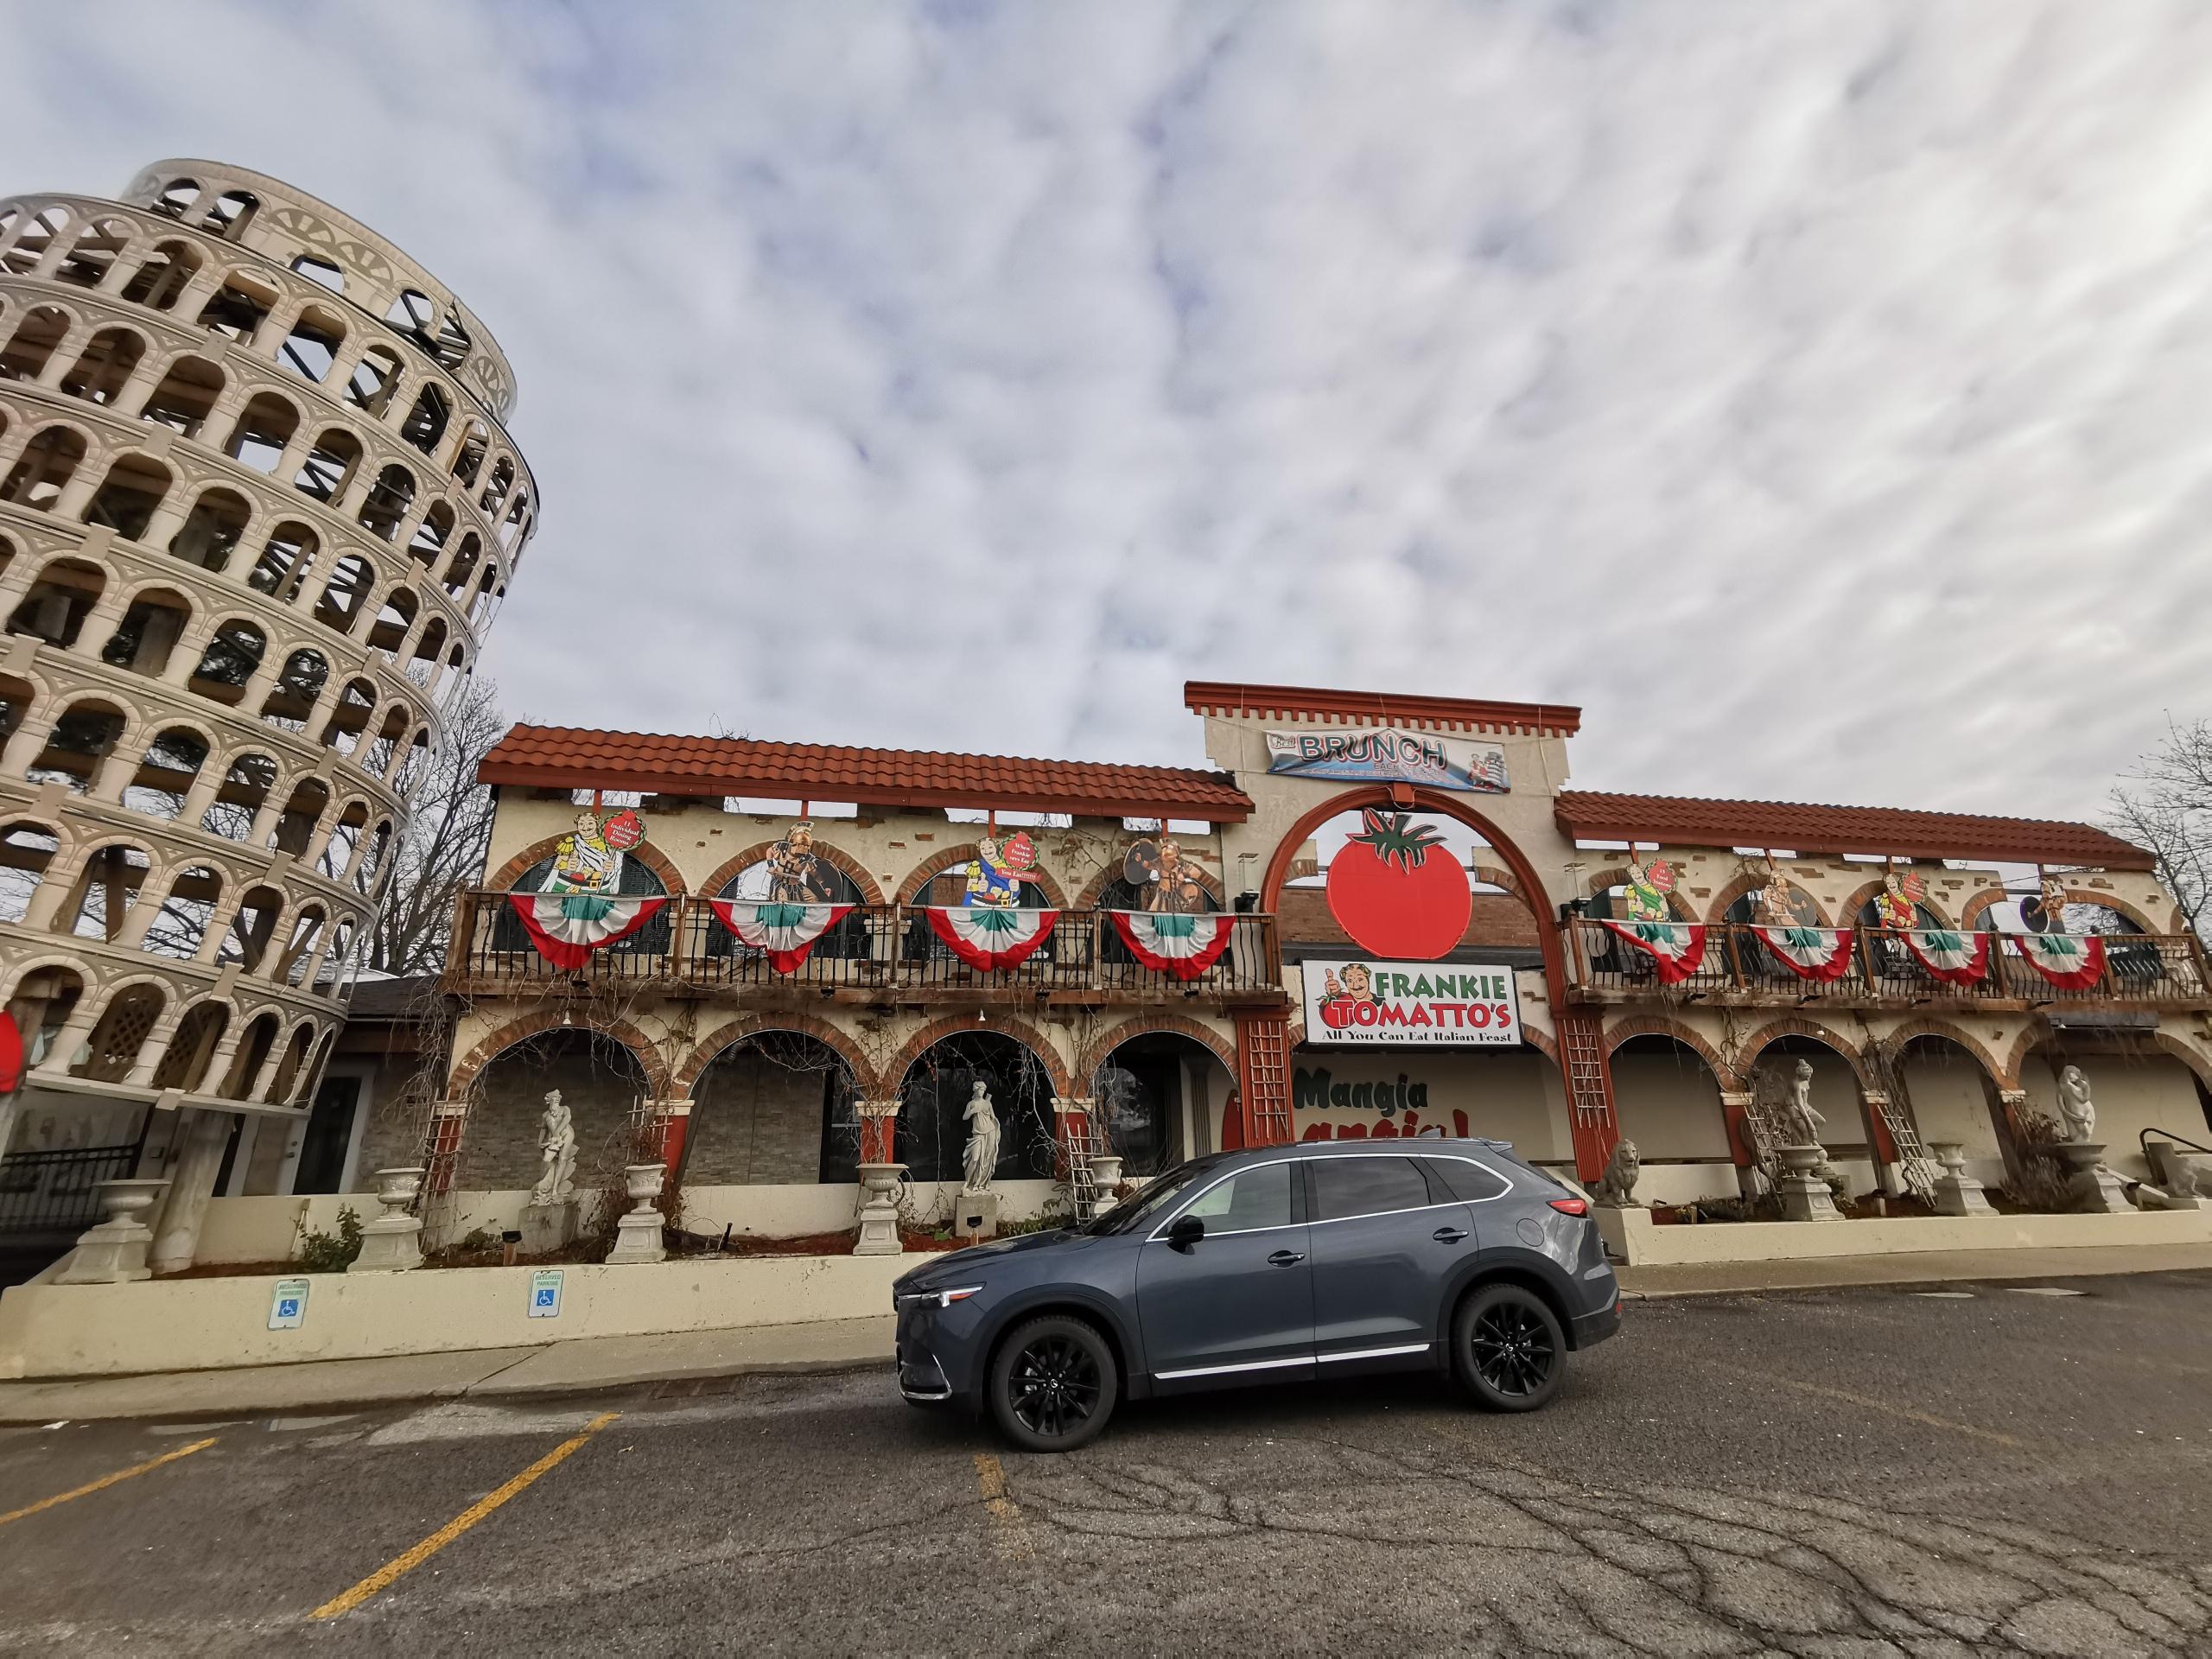 (On the MOVE) with 2021 Mazda CX-9 Kuro Edition 黒 – Explore & Discover [Ontario Travel Series]